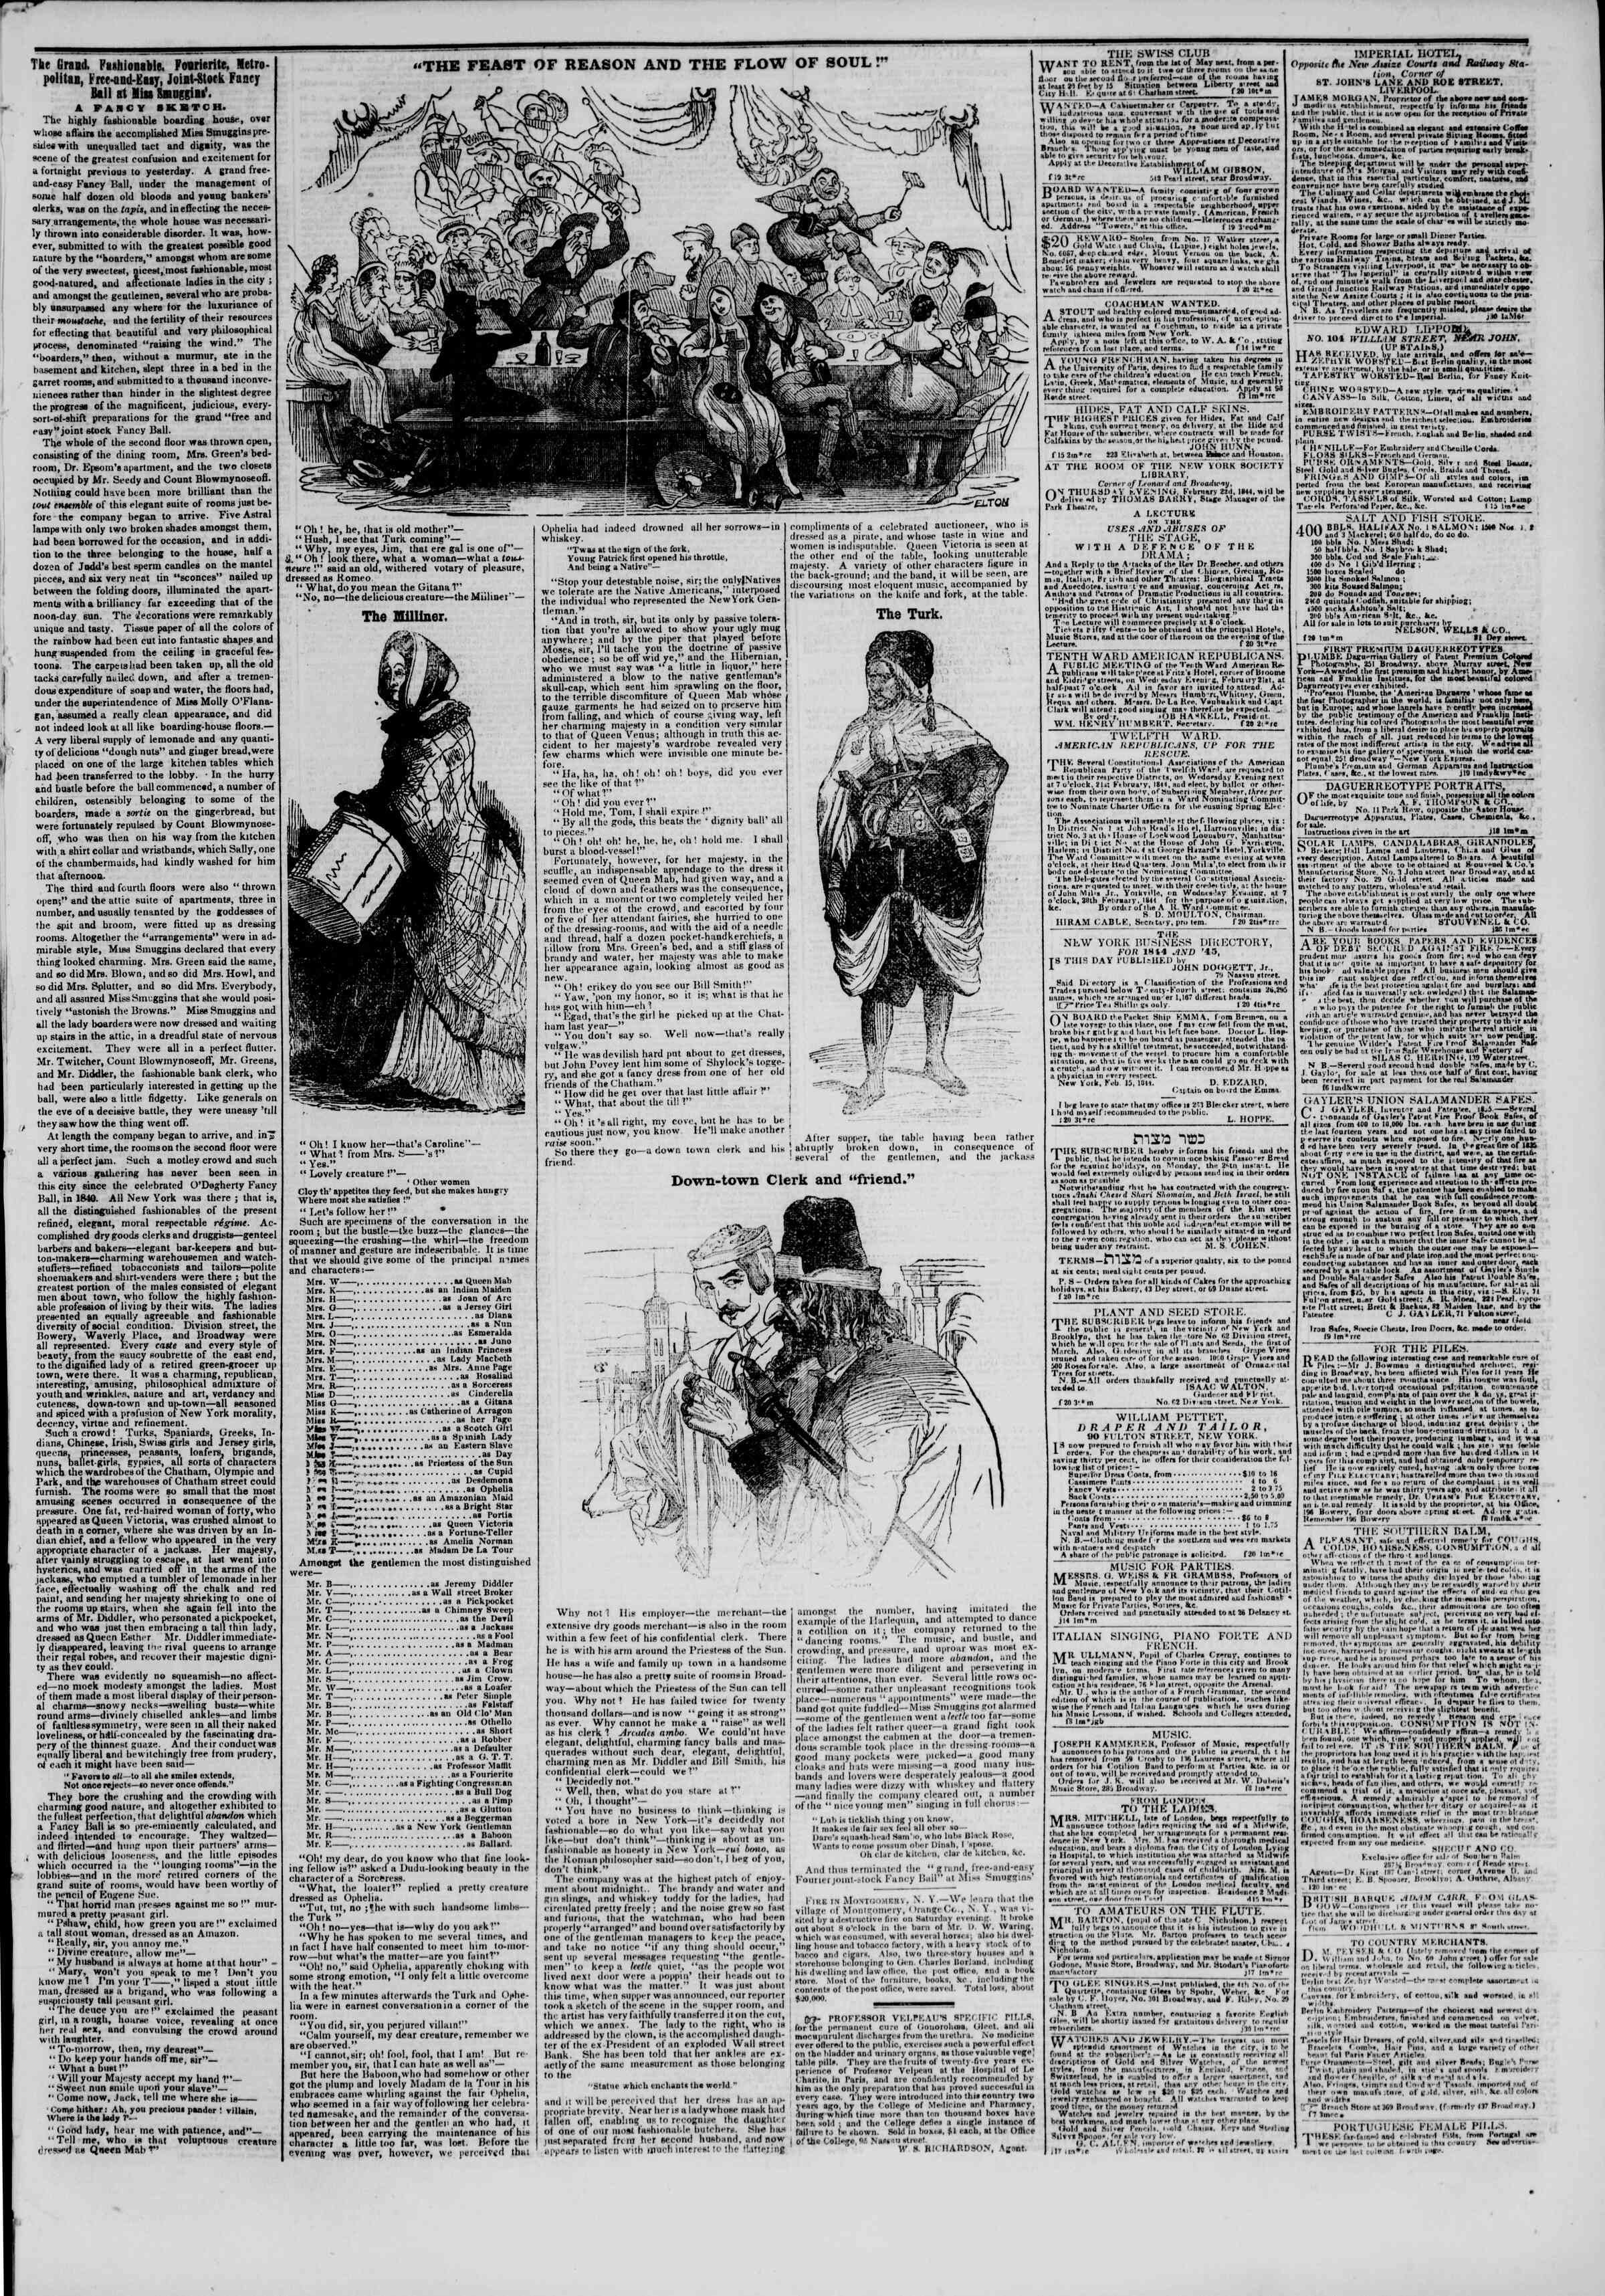 February 21, 1844 Tarihli The New York Herald Gazetesi Sayfa 3